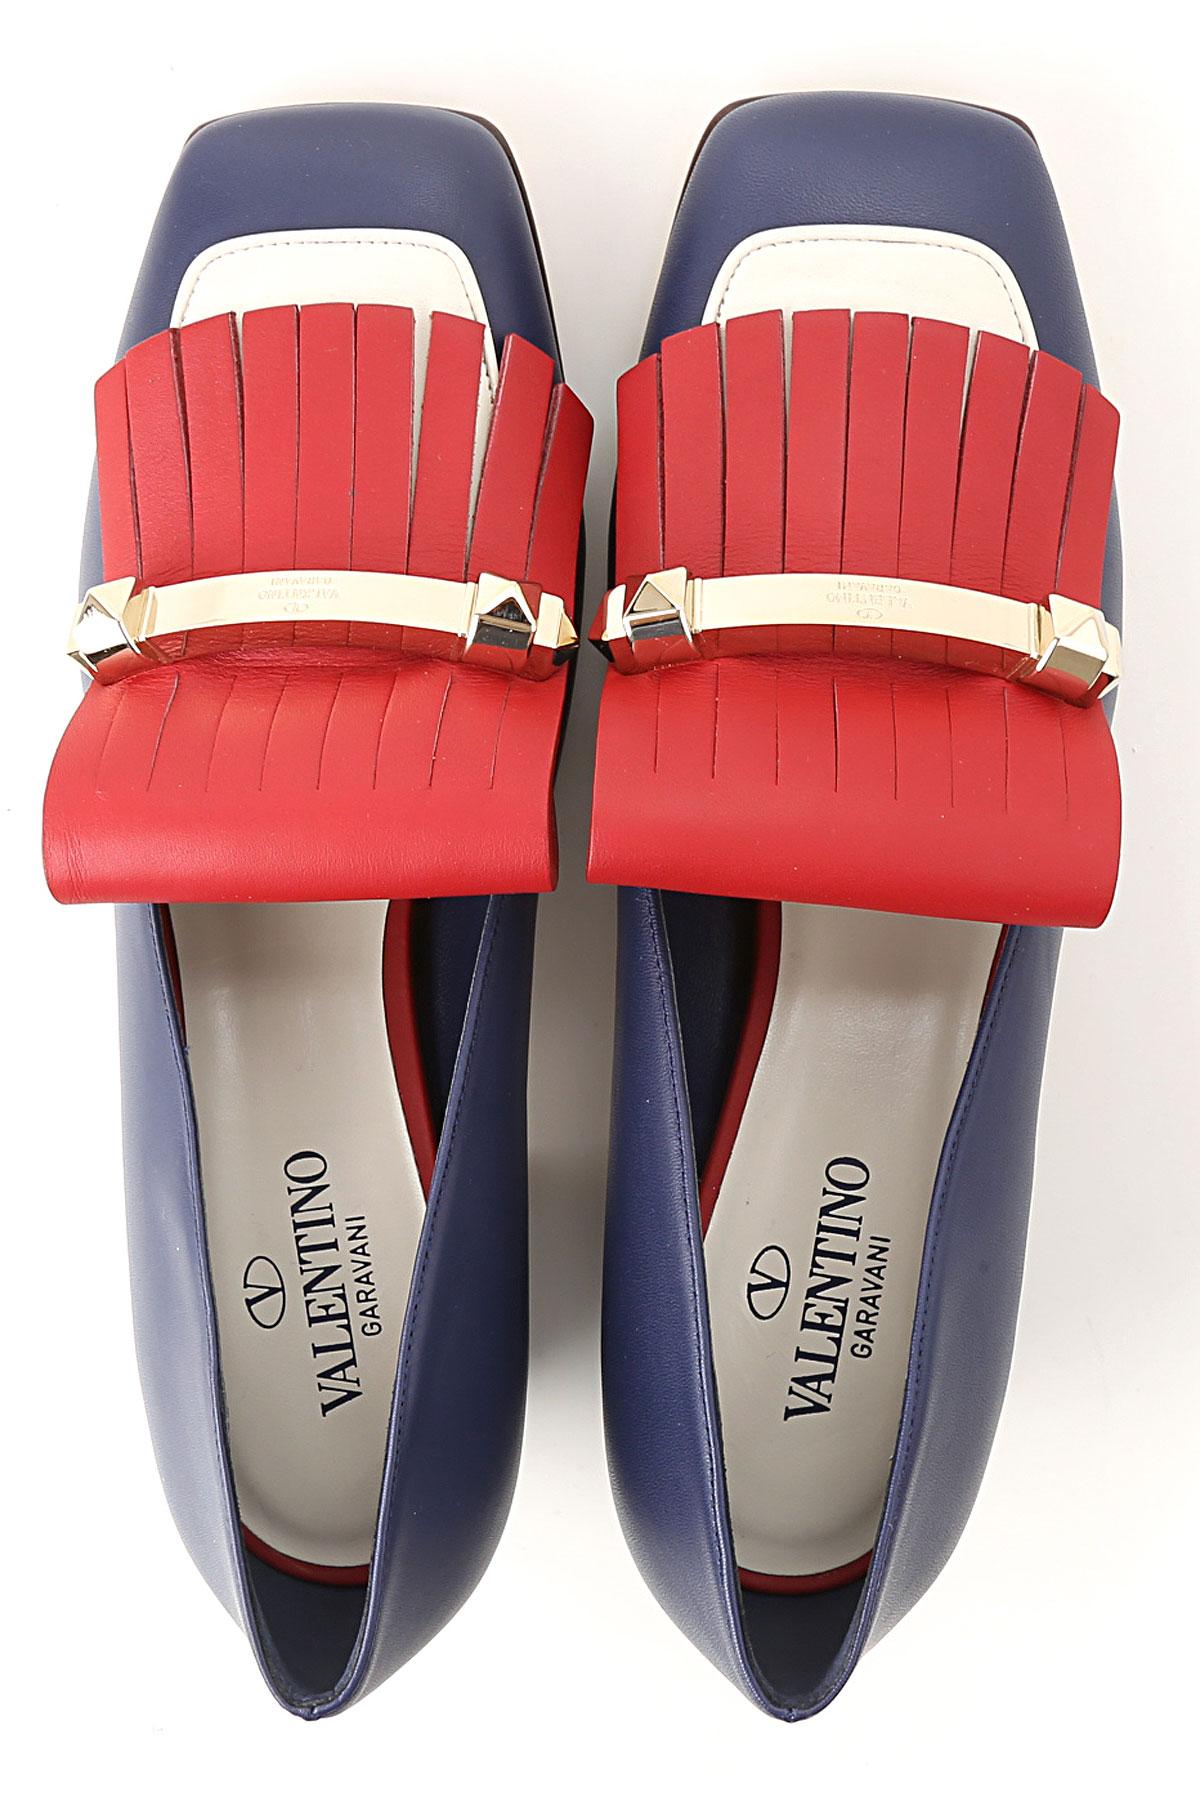 Azul Para Garavani Primavera verano Rojo 2019 Valentino Zapatos Mujer SzwFWn1q